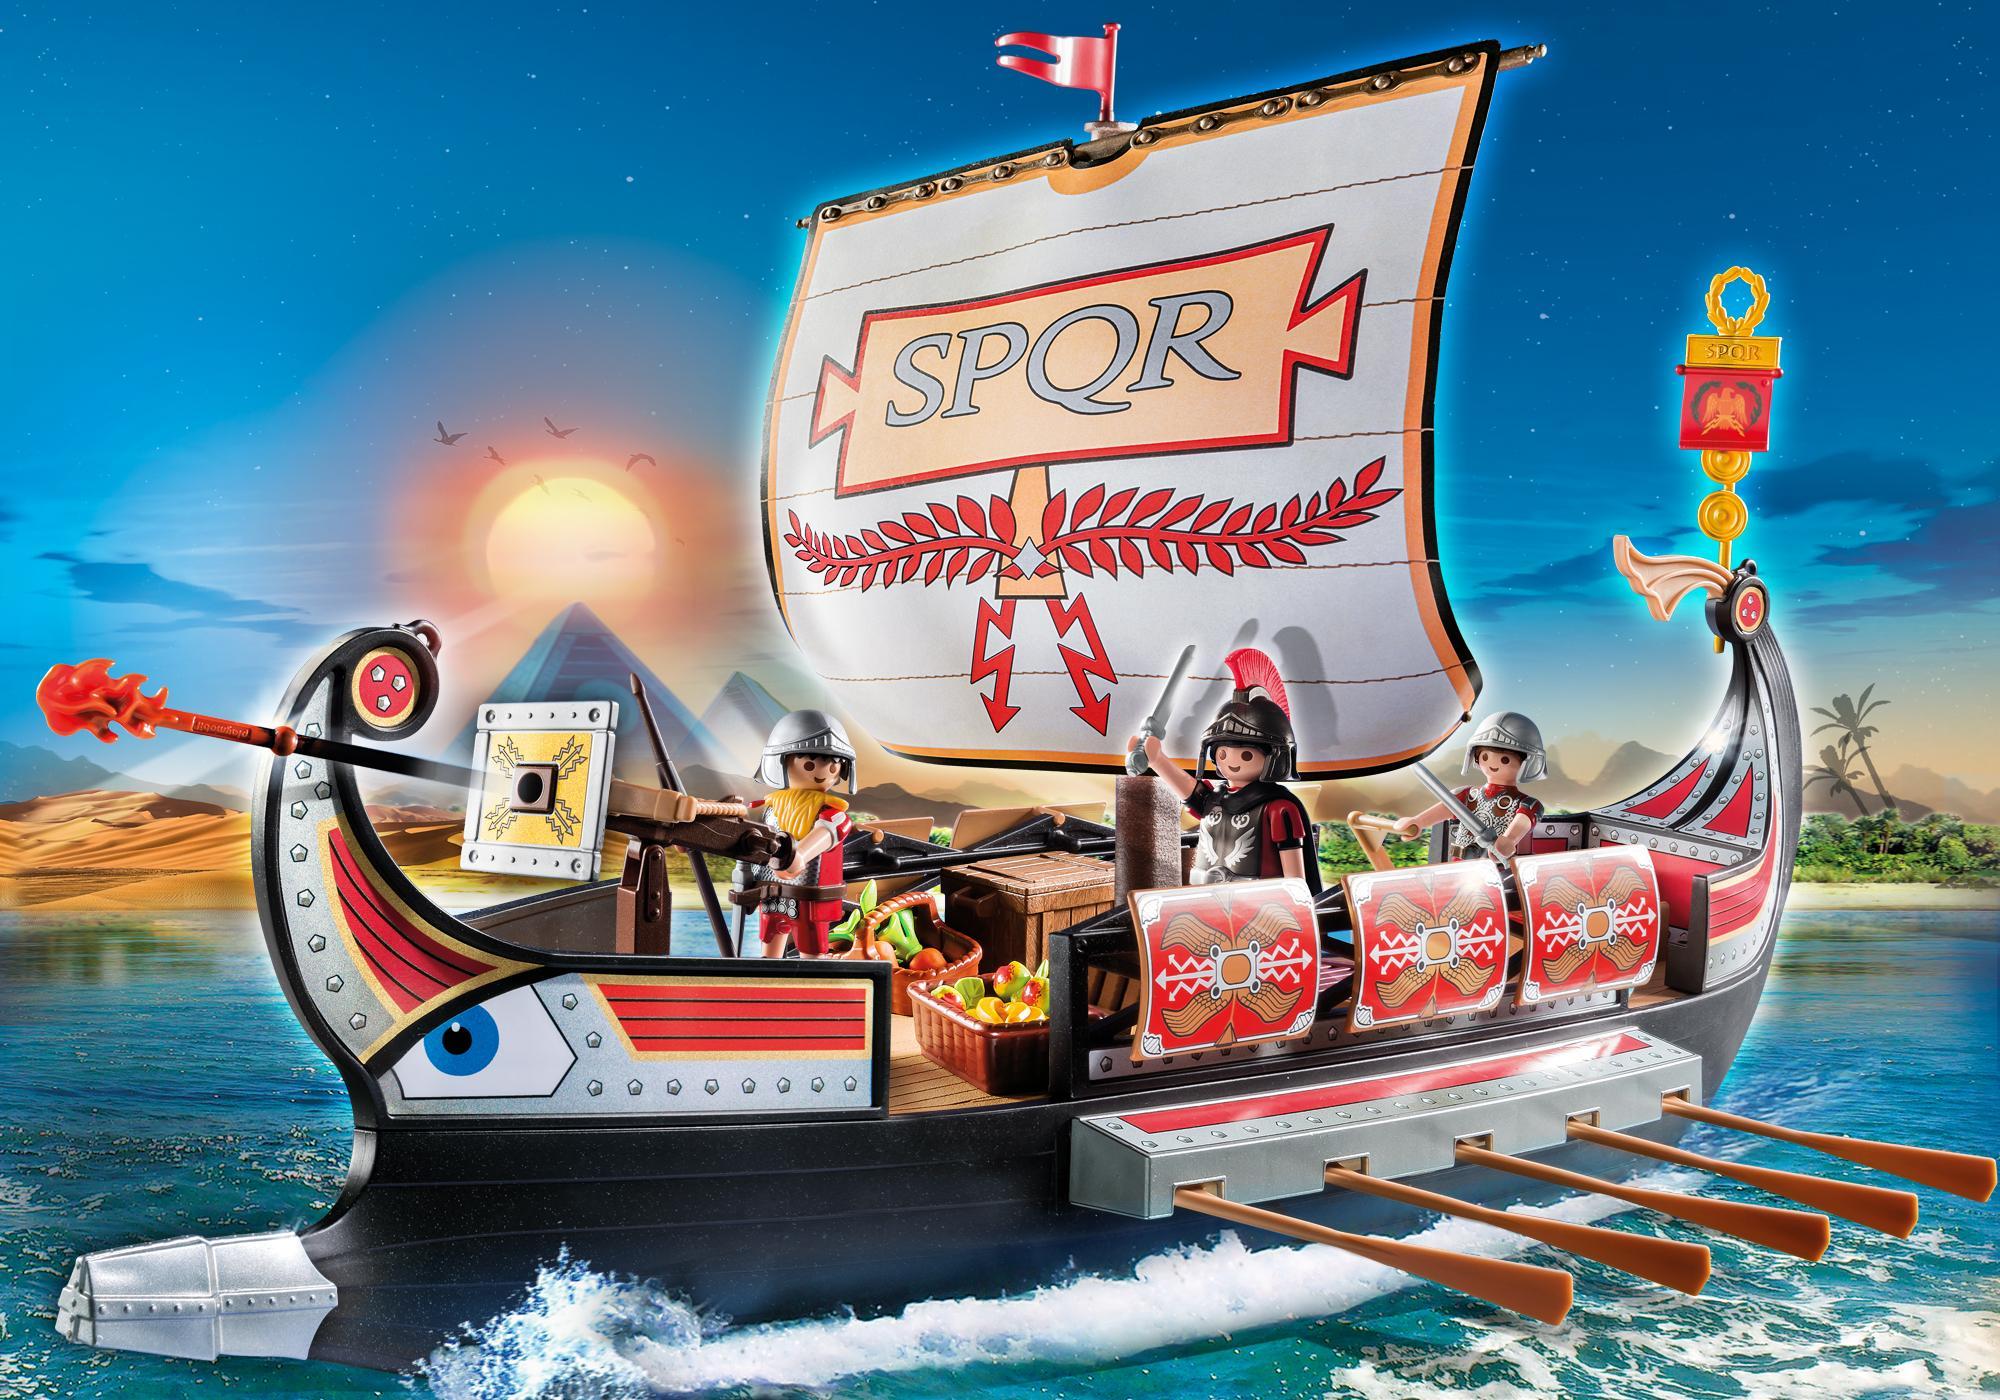 http://media.playmobil.com/i/playmobil/5390_product_detail/Roman Warriors' Ship